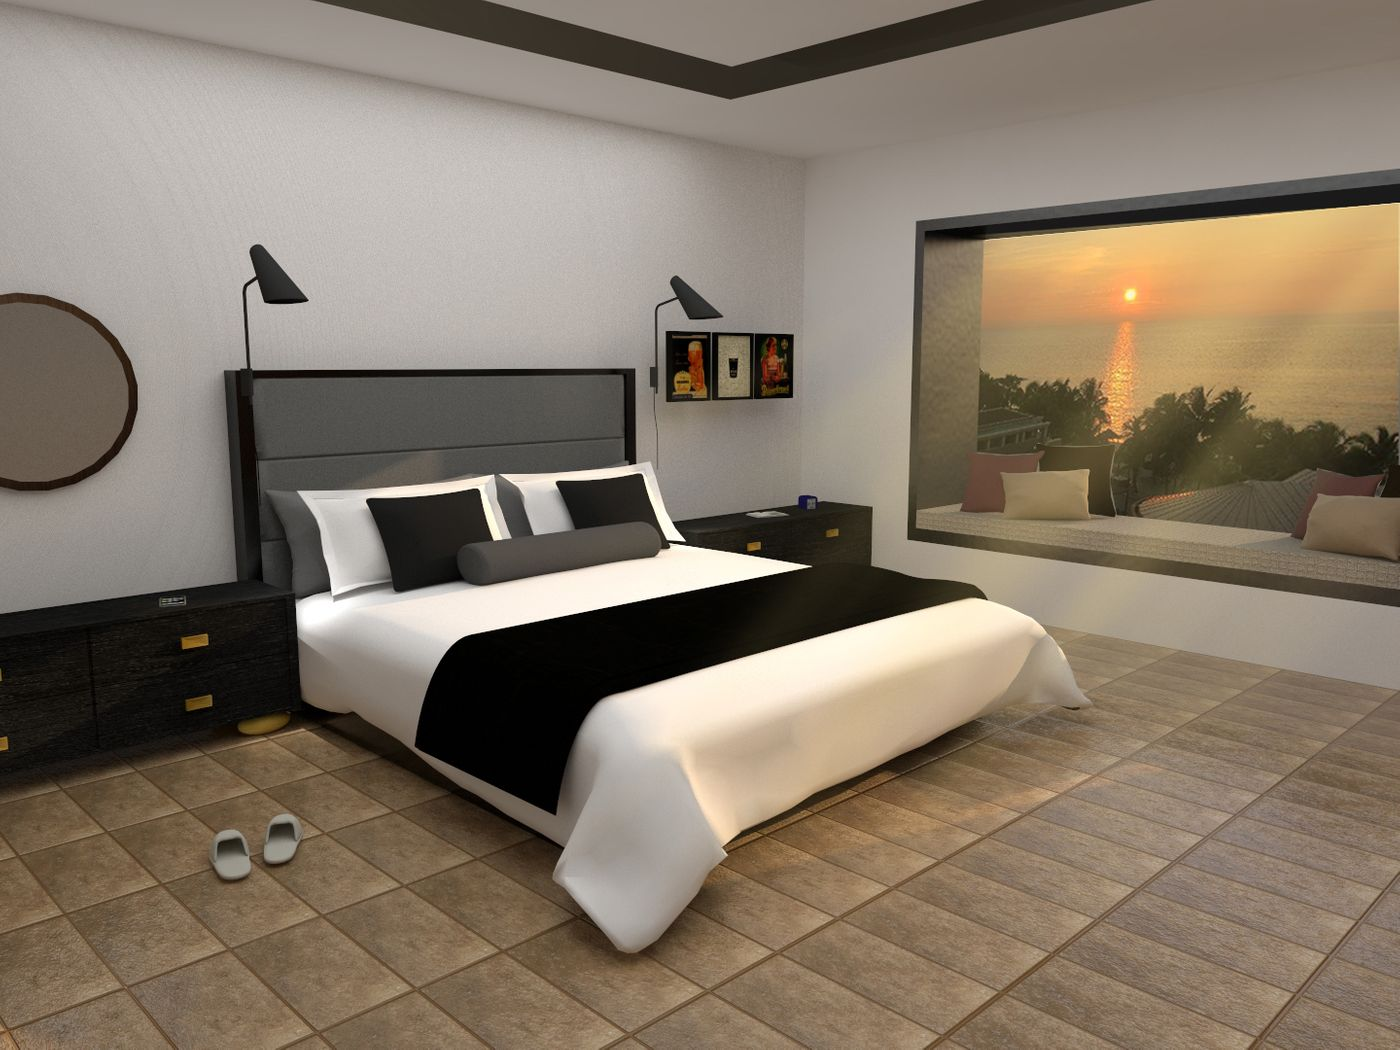 Bedroom Jenniferrlinn